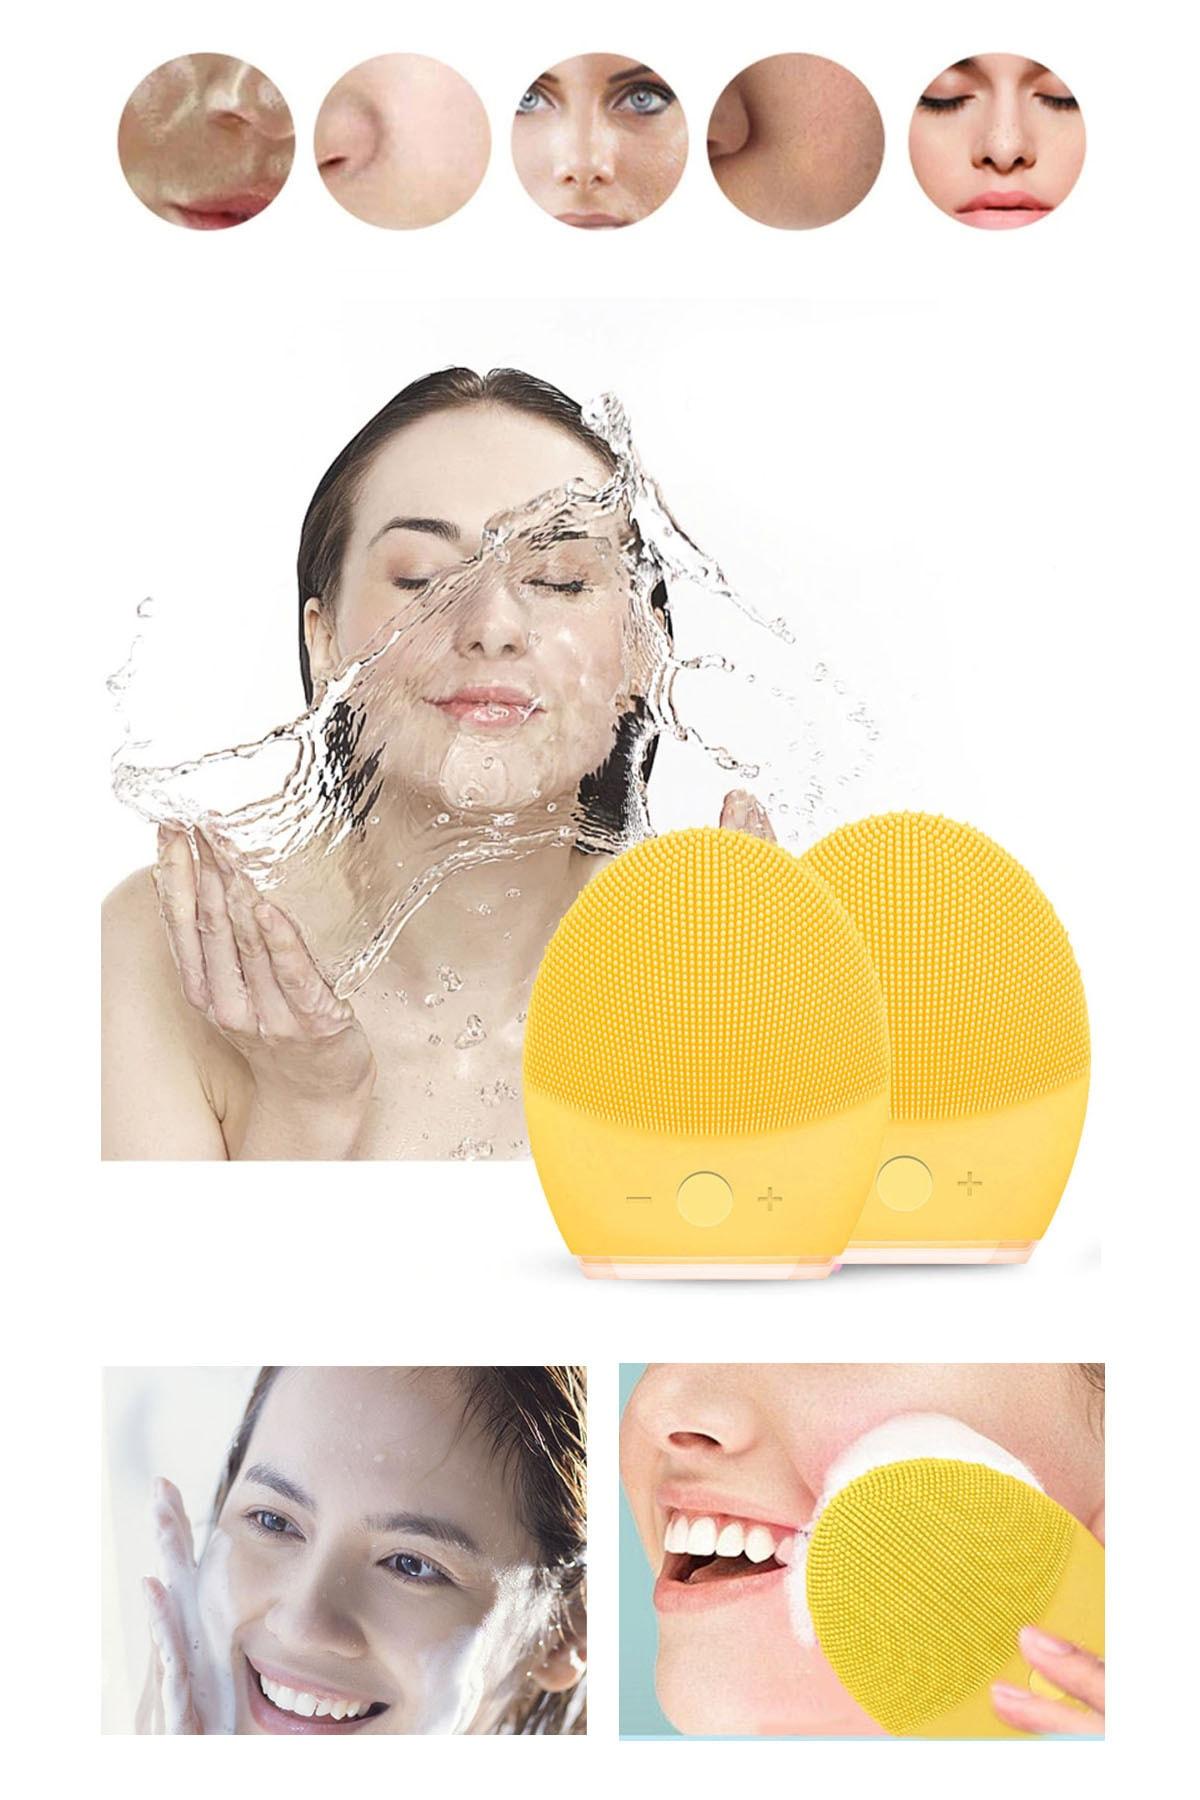 xolo Sarı Rimy Mega Büyük Boy Geniş Şarjlı Yüz Temizleme Masaj Cihazı Aleti 2